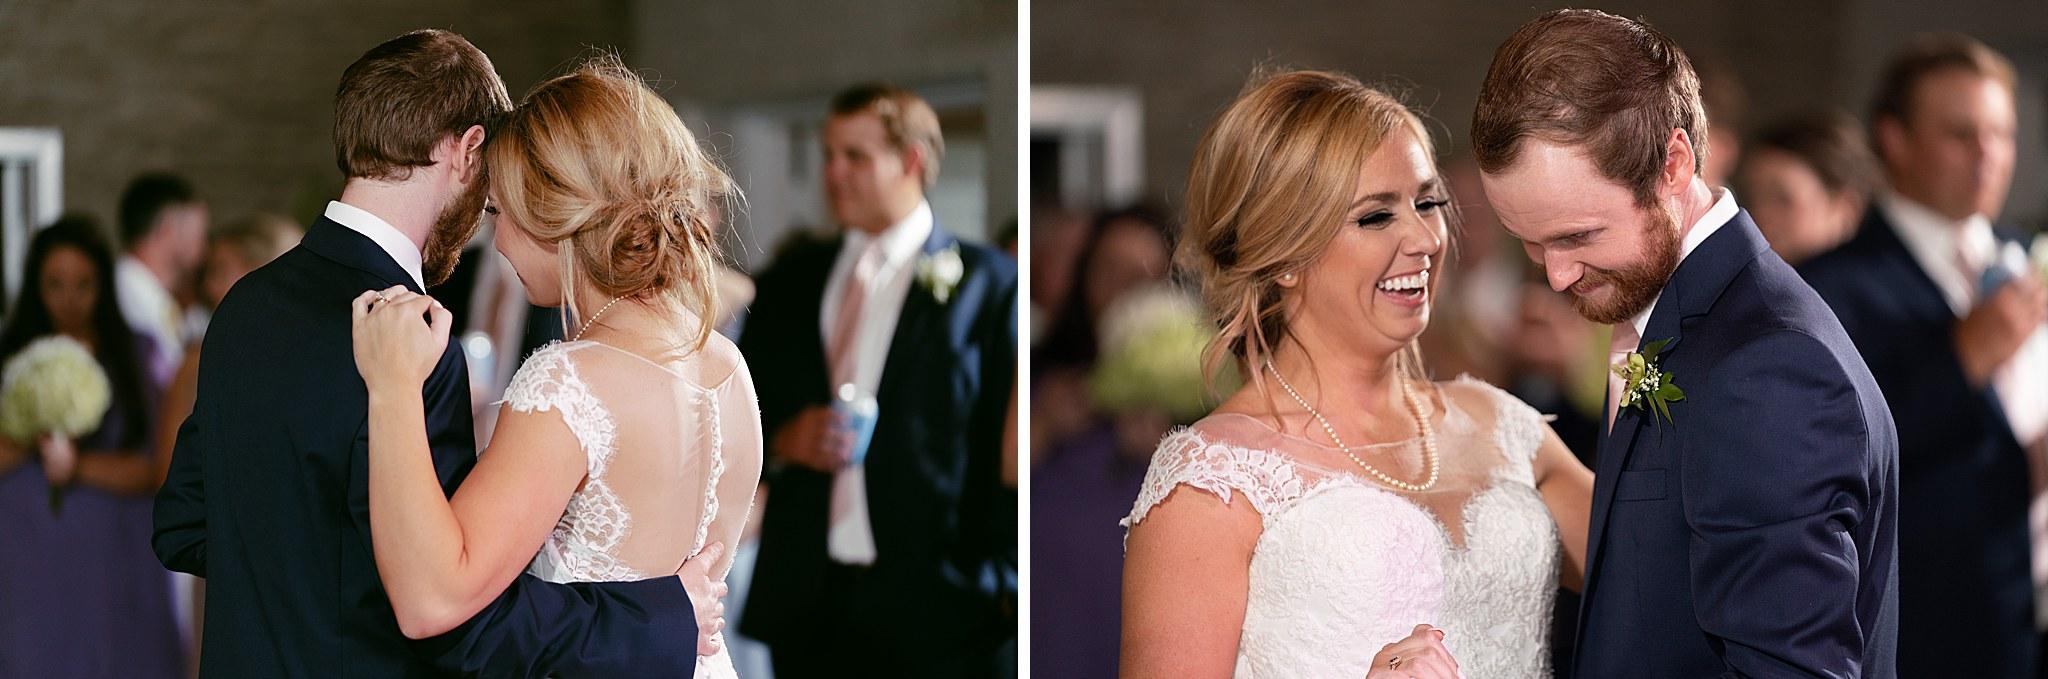 Williamston-NC-Wedding-Photographer 0033.jpg